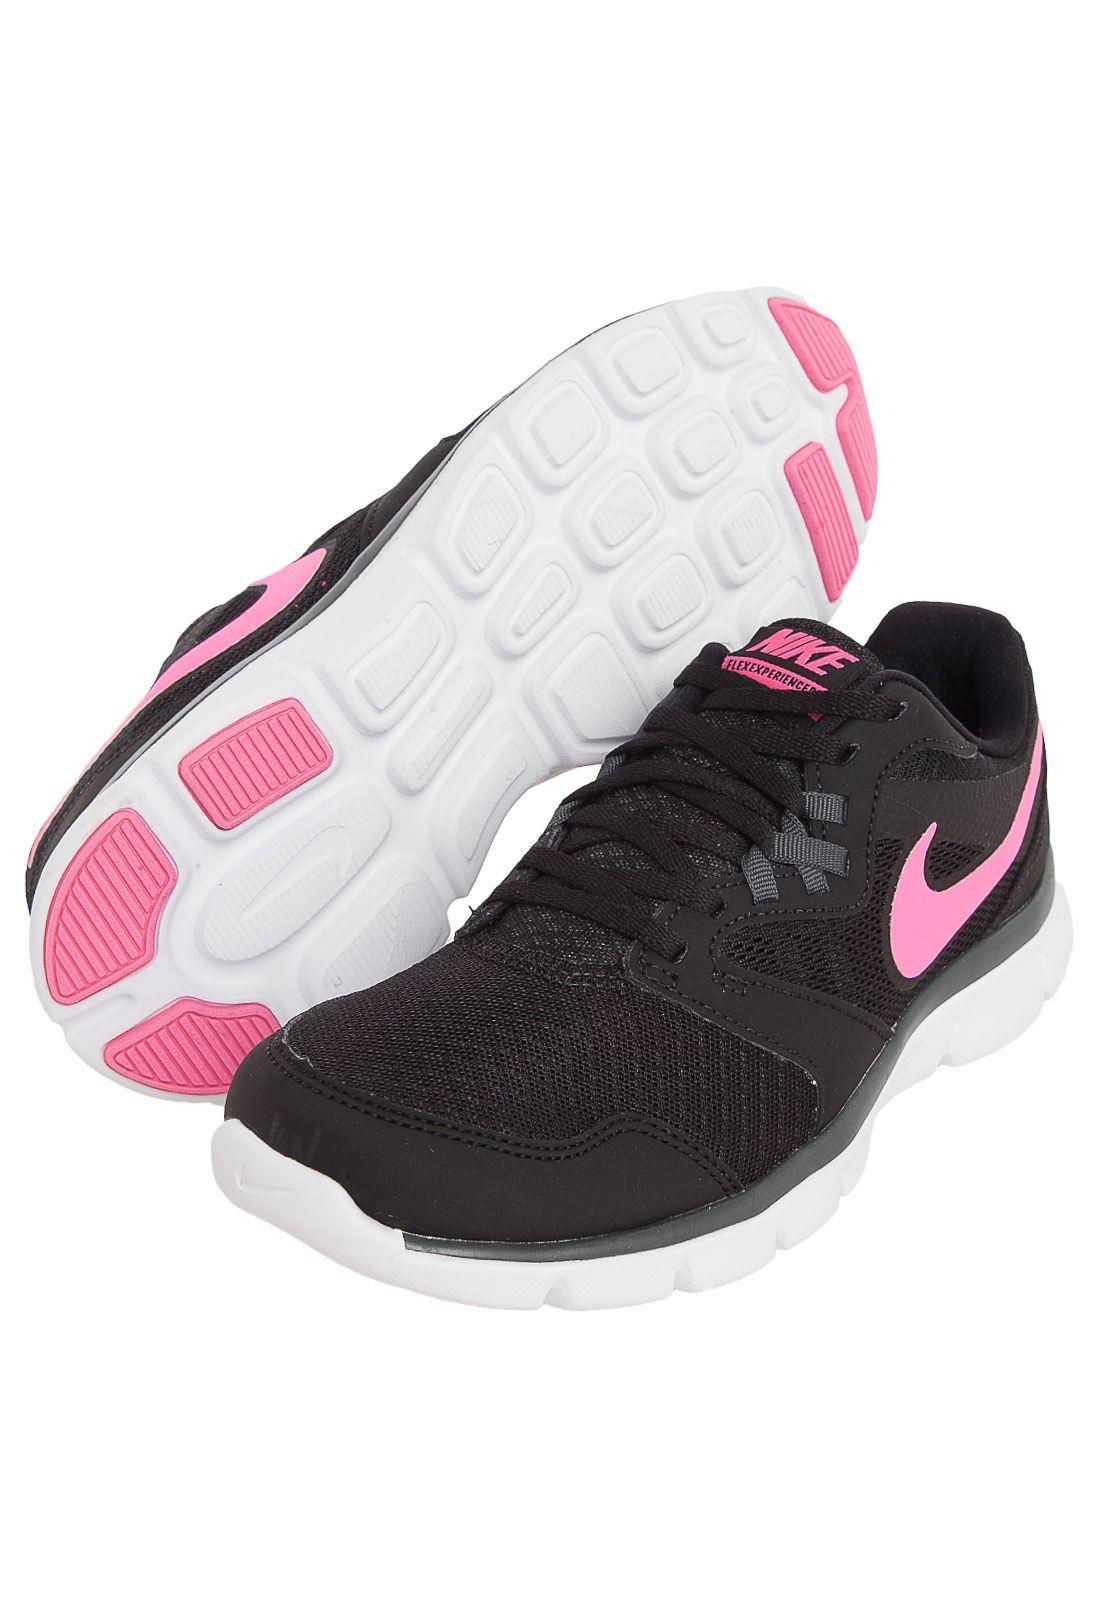 c407437d826fb Tênis Experience Nike Flex Experience Tênis RN 3 MSL Preto Compre Agora  Dafiti 58fab7